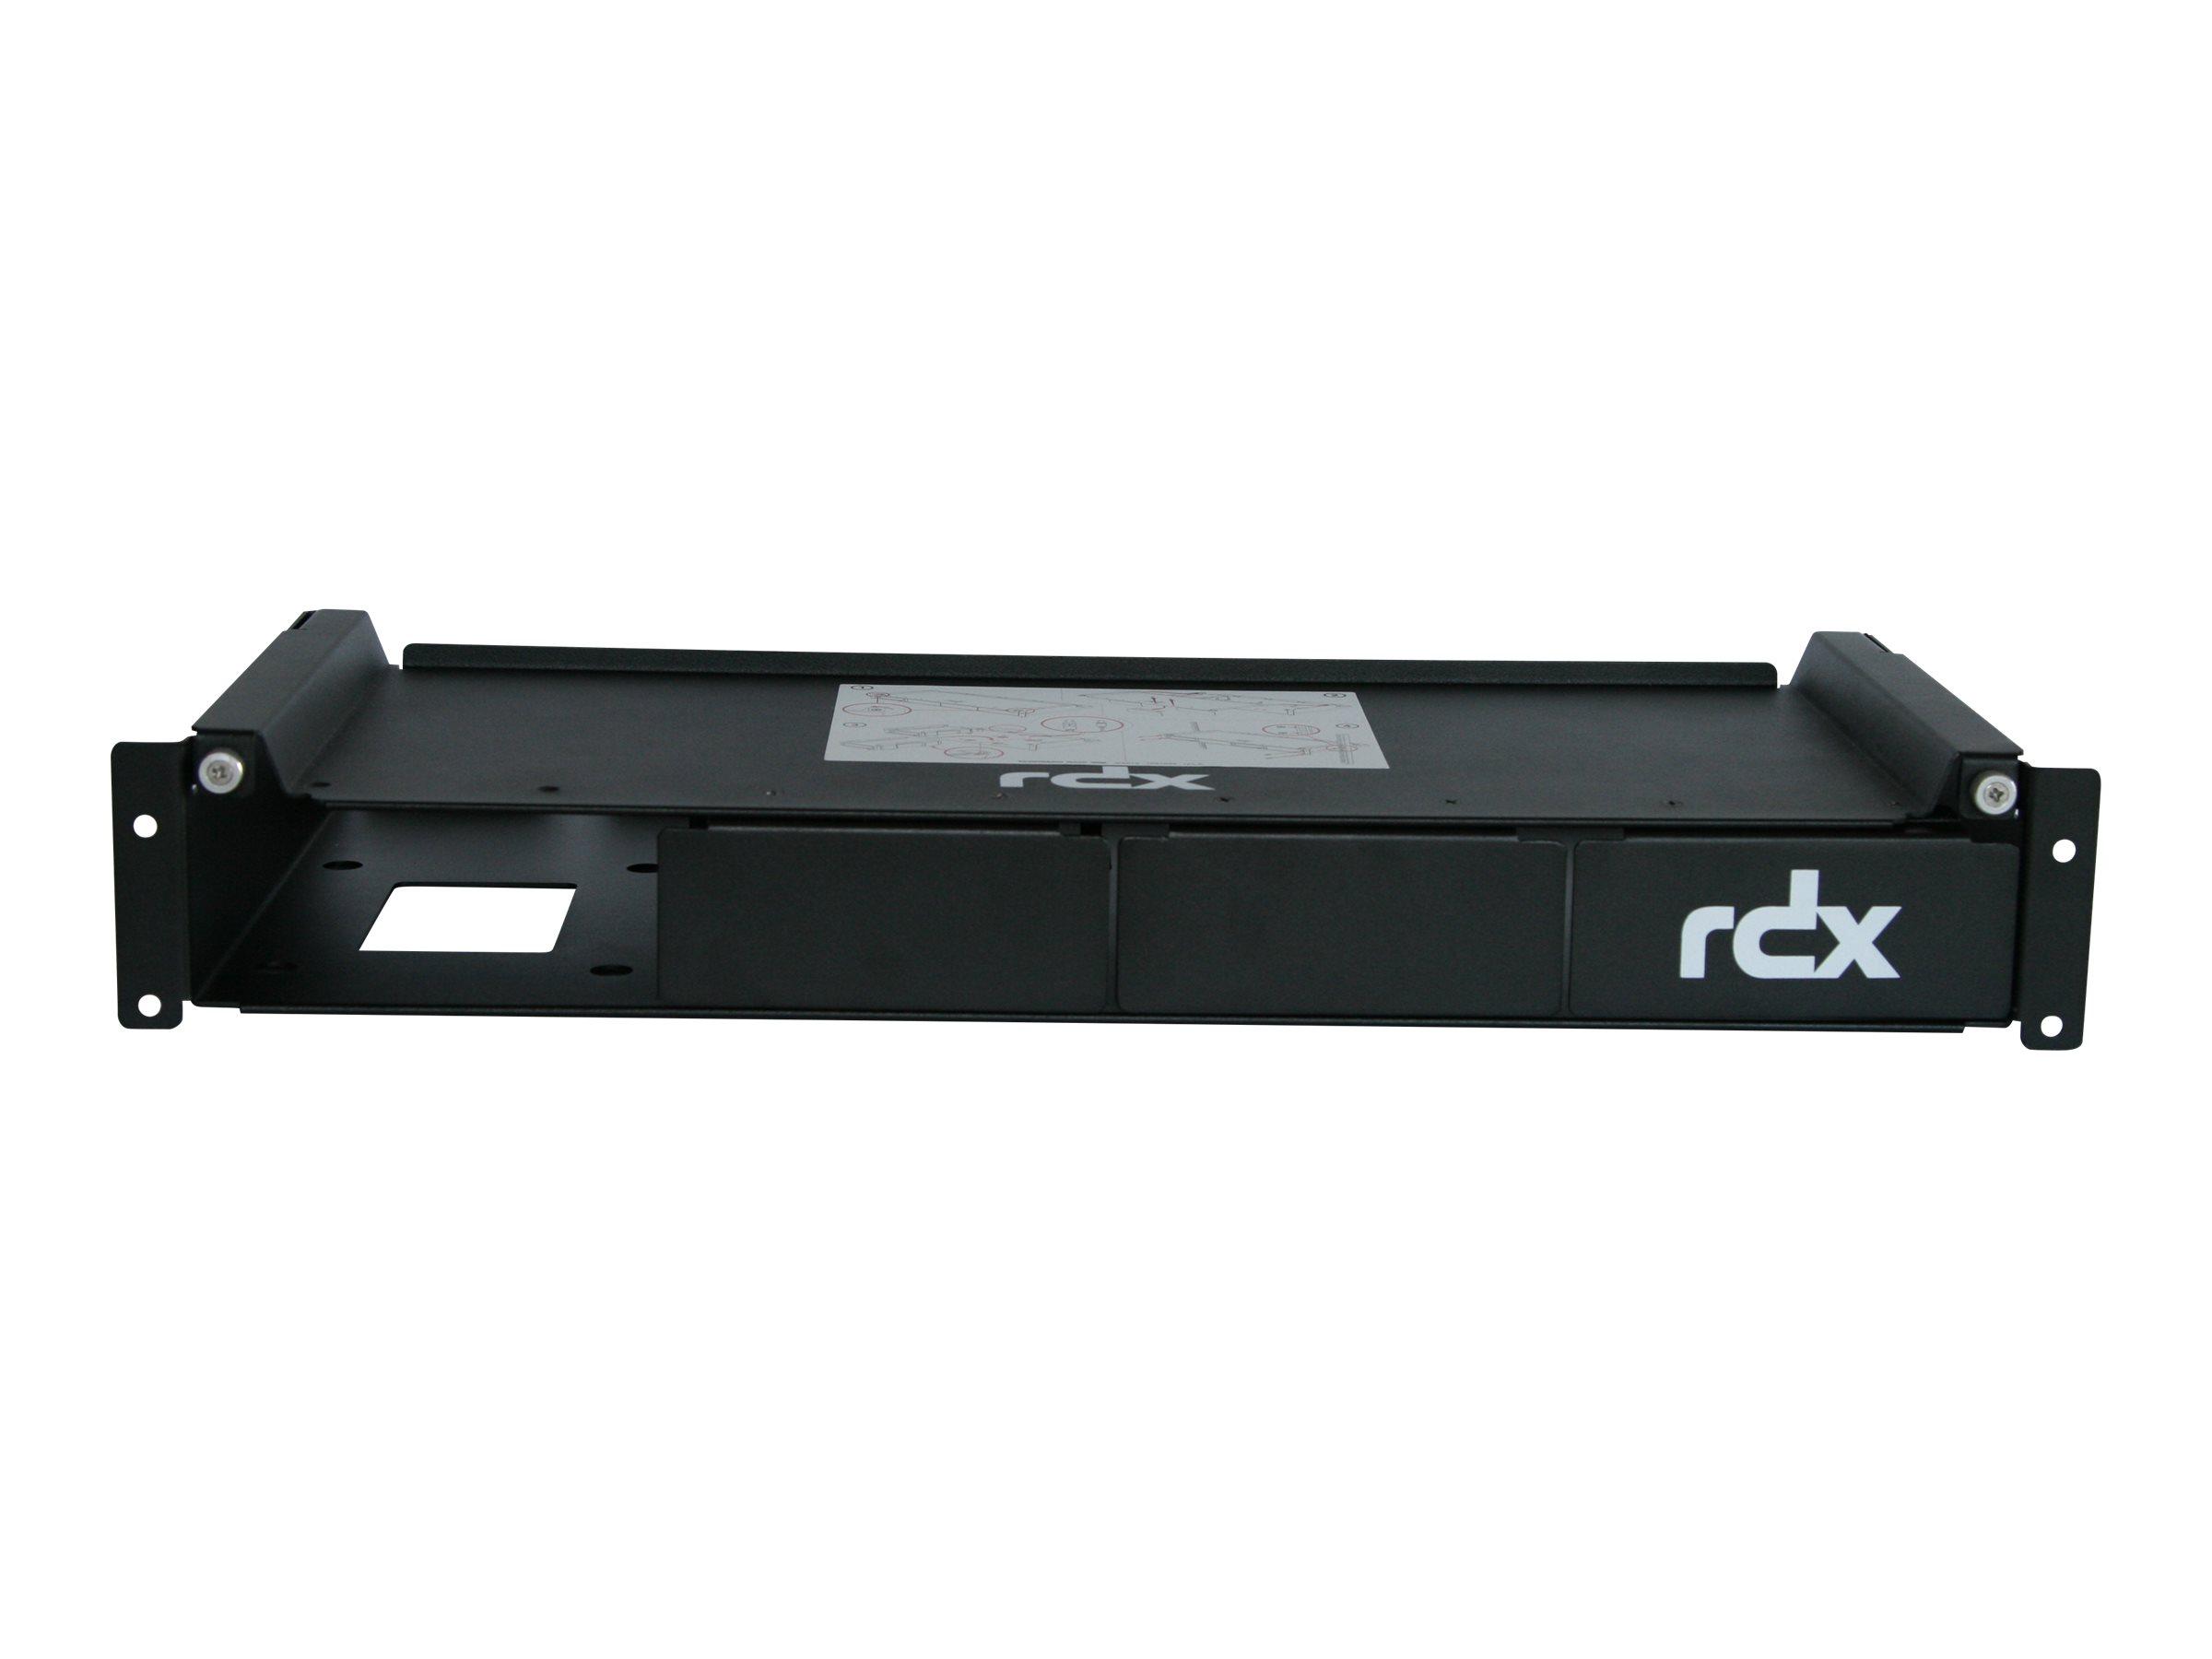 Overland-Tandberg RDX QuadPAK - Rackmontagesatz - Kapazität: 4 RDX Laufwerke